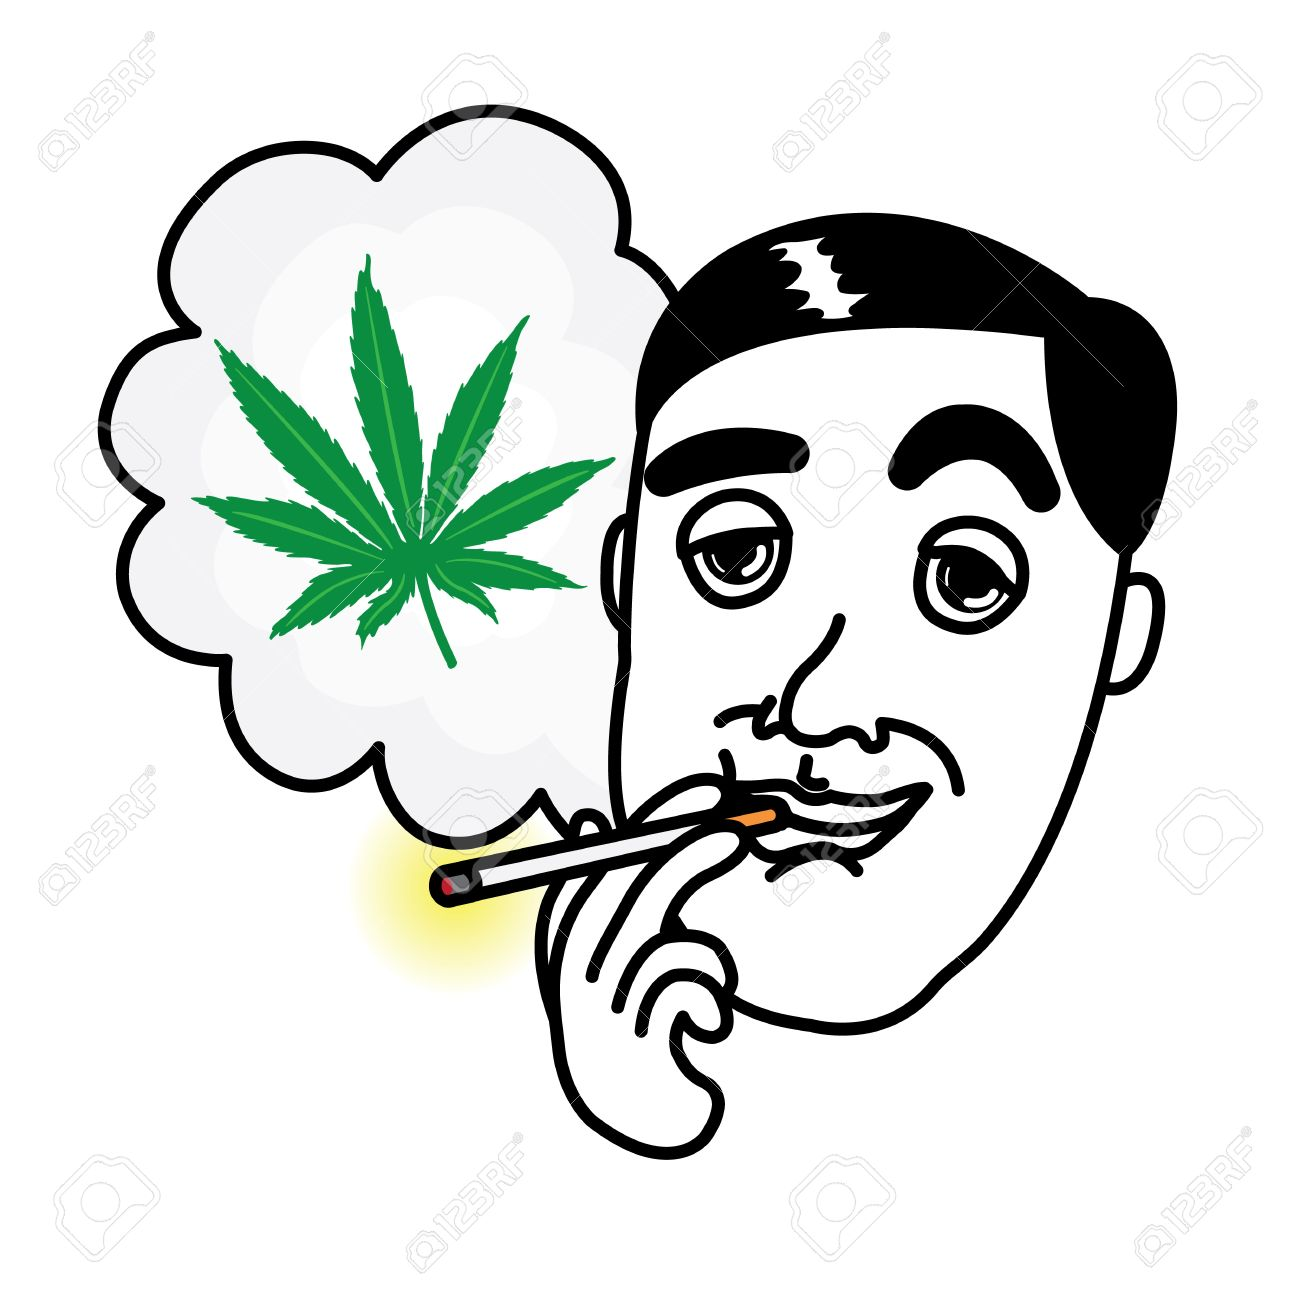 Man Smoking Cannabis Cigarette Royalty Free Cliparts Vectors And